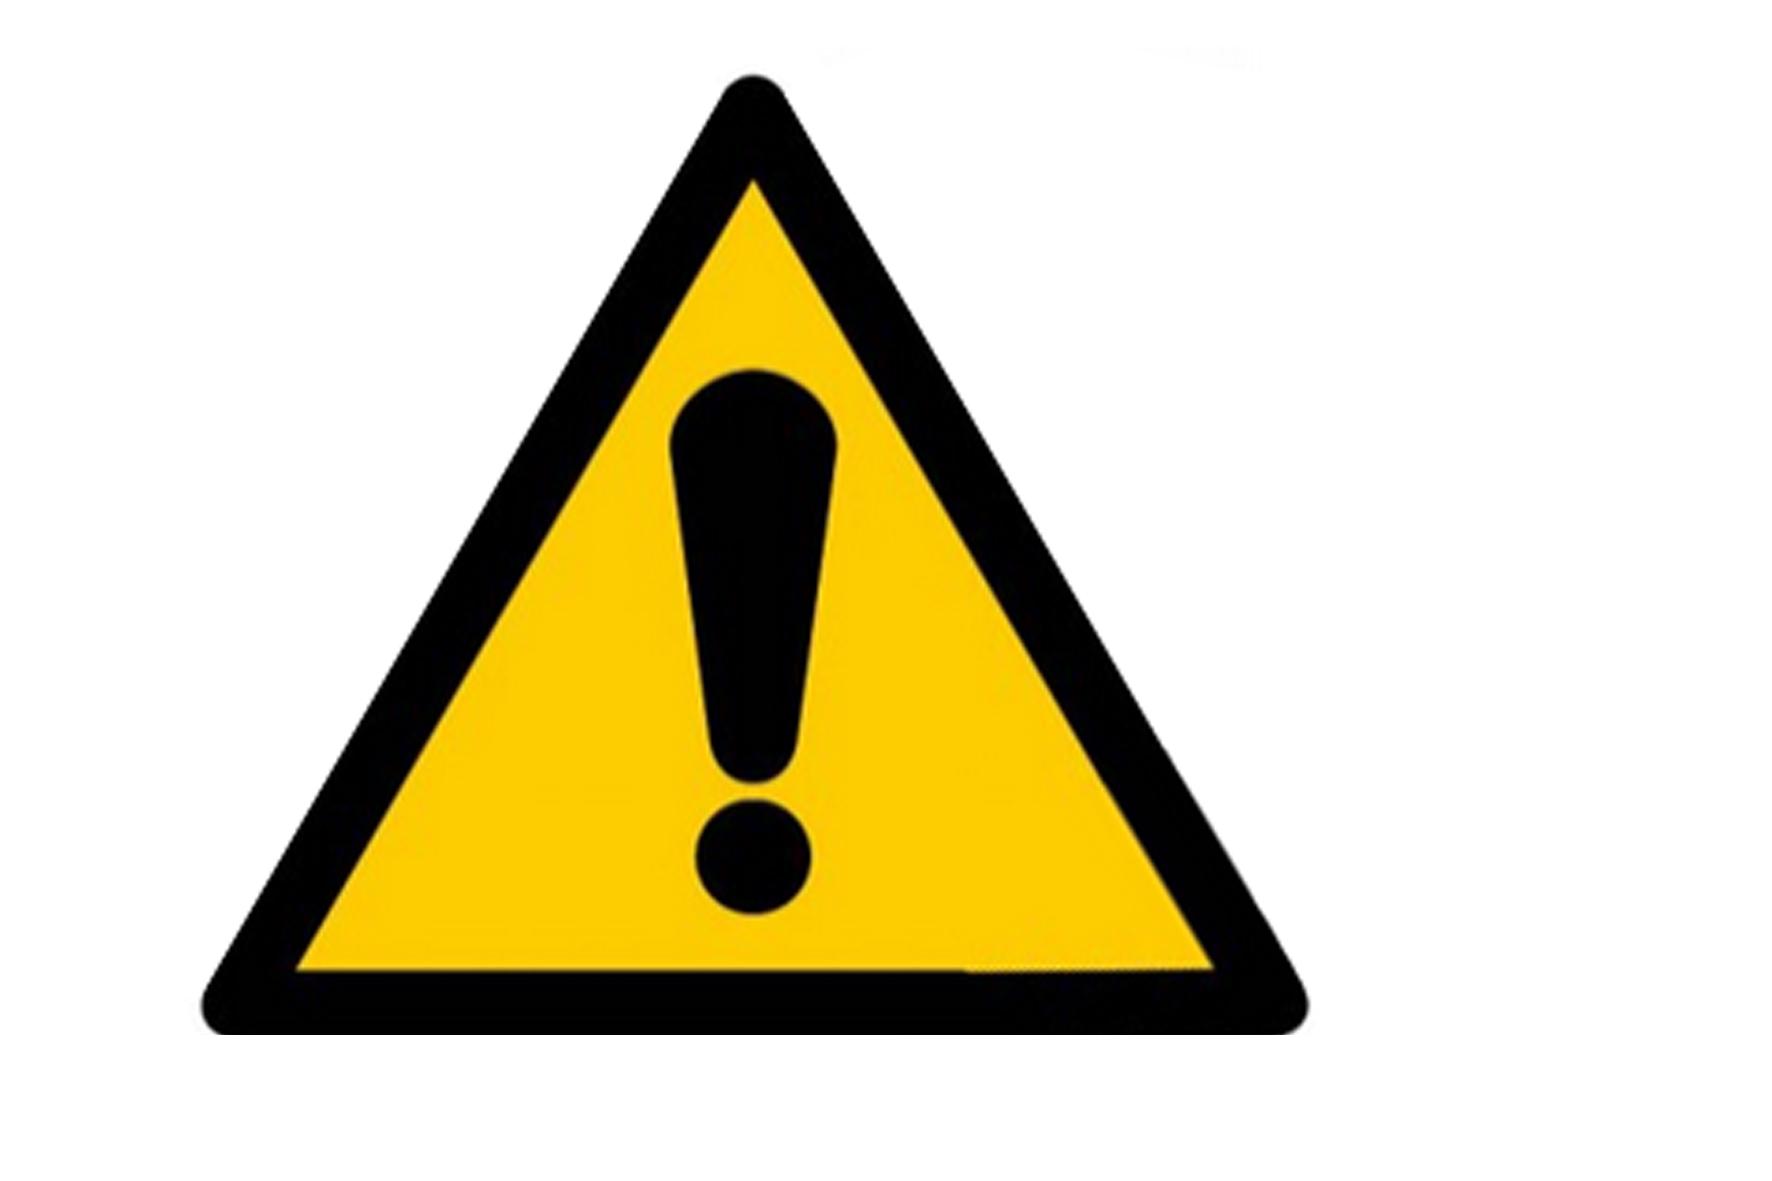 https://www.leboutte.be/images/catalogue/batiment/panneau-triangle-danger-attention.jpg